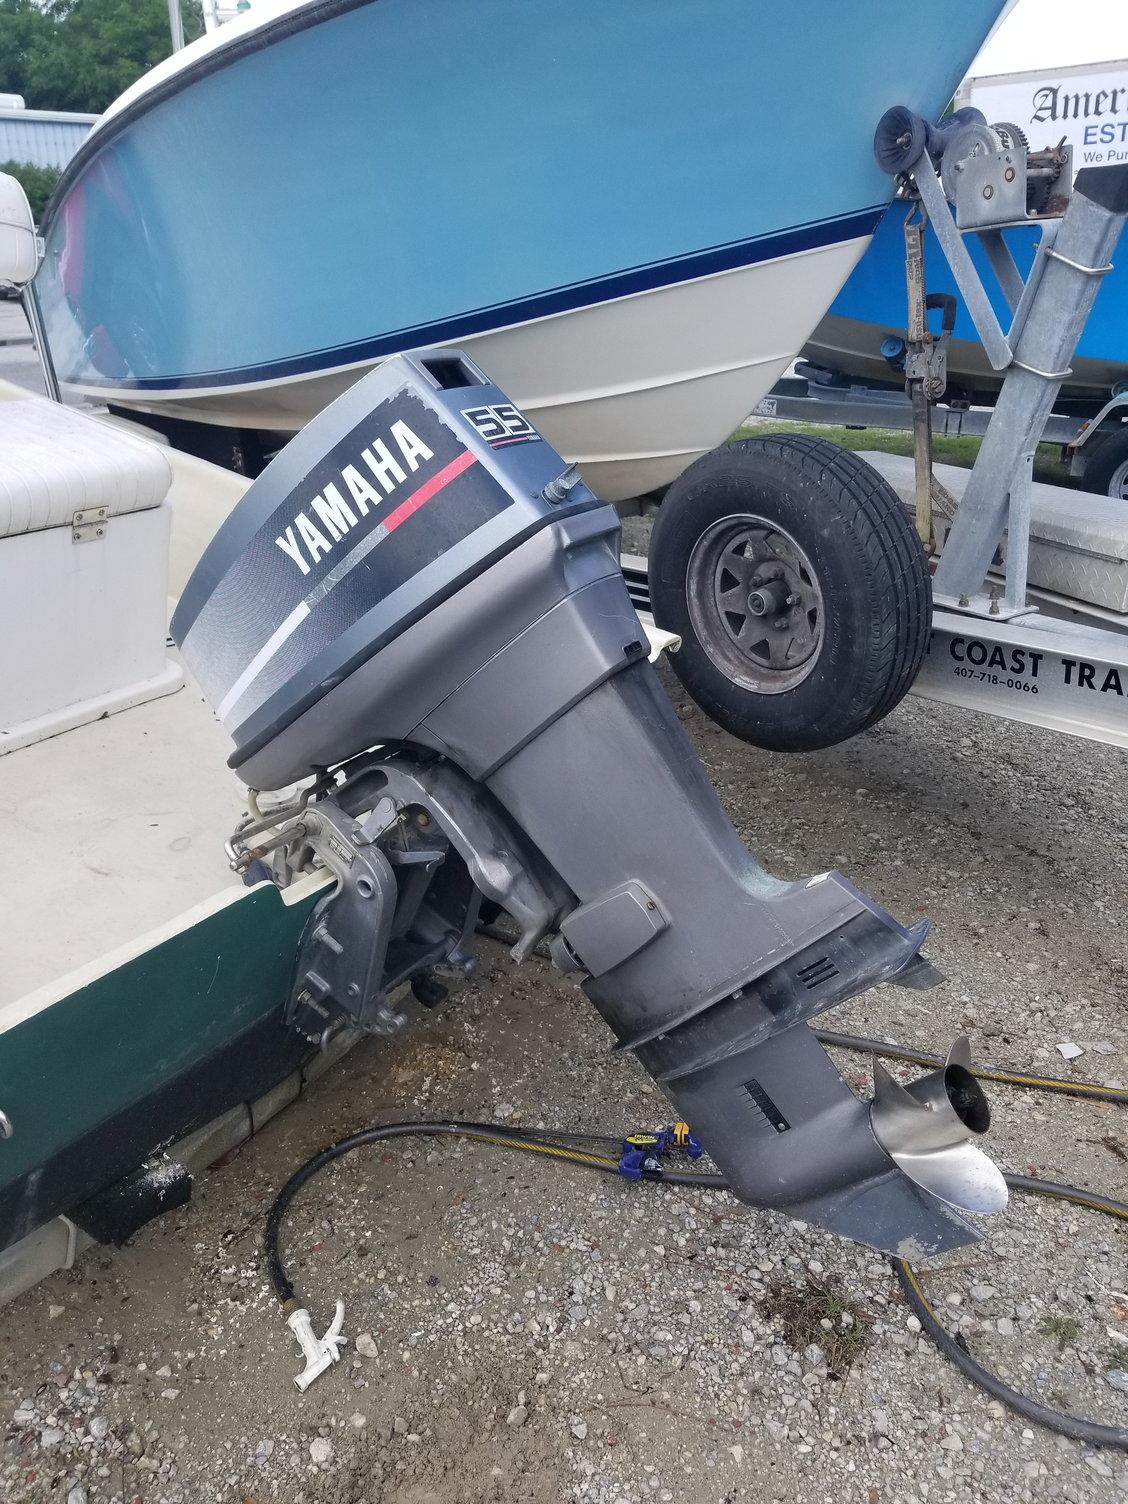 F B Ef C A E A D C A Bad on Yamaha Outboard Starter Parts